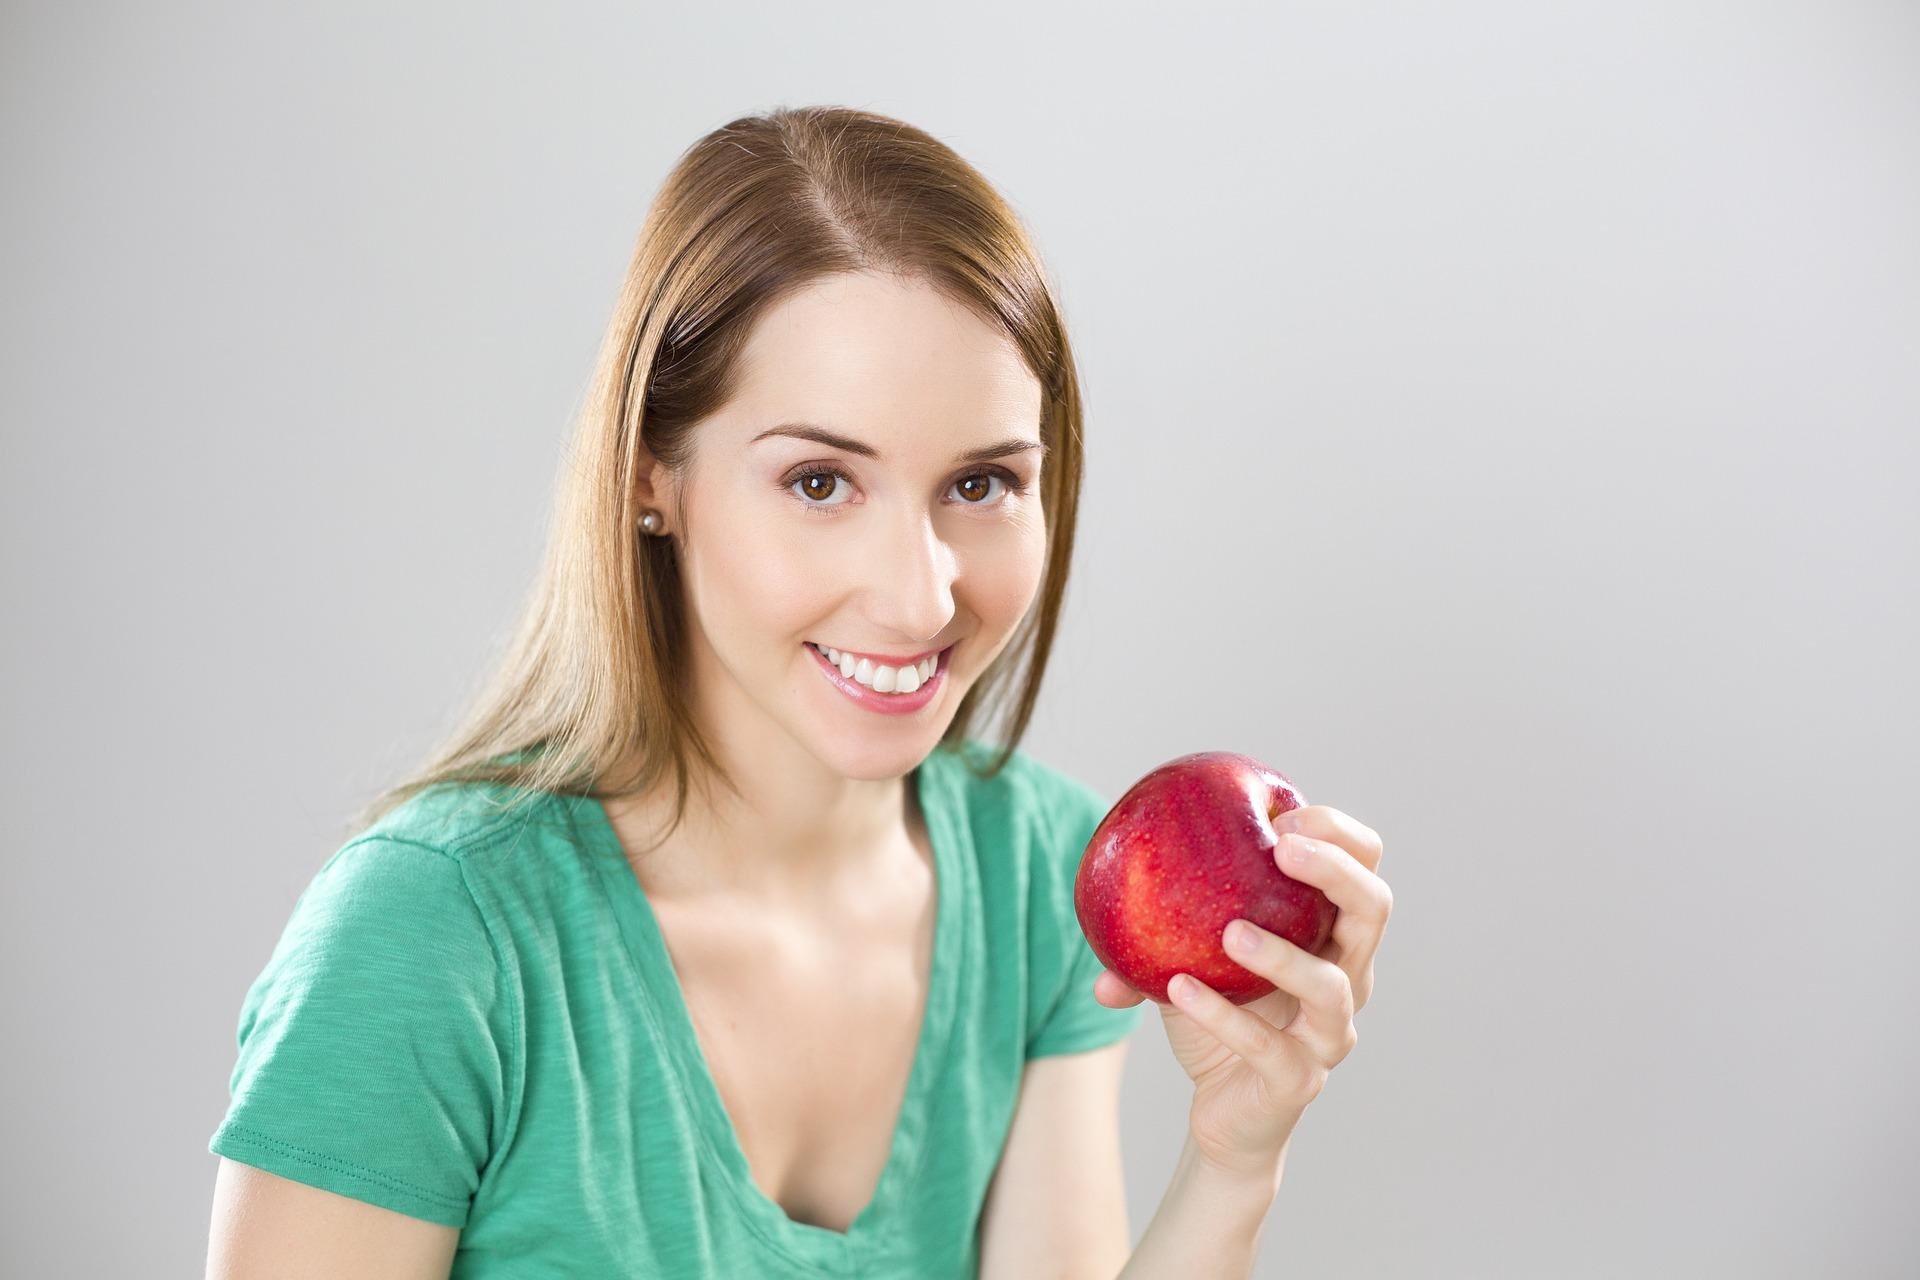 cum sa slabesti - sfatulparintilor.ro - pixabay_com - apple-841169_1920